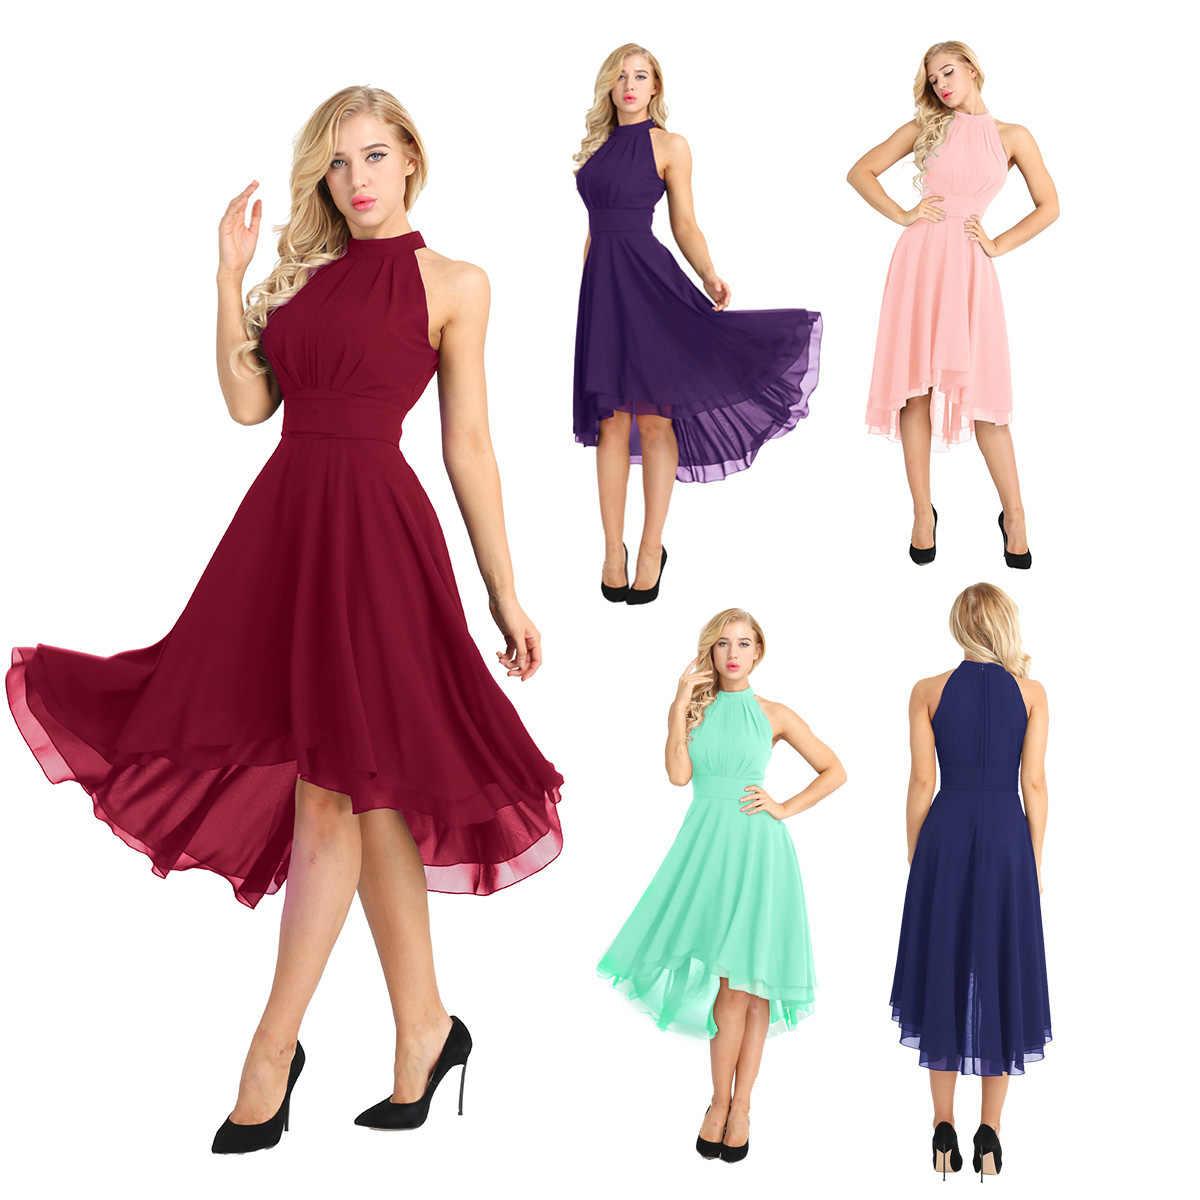 c0faff4e9c782 Chiffon Bridesmaid Formal Dress Women Elegant Vestido Verao Sleeveless  Halter Wedding Party Dress Summer Women Dress